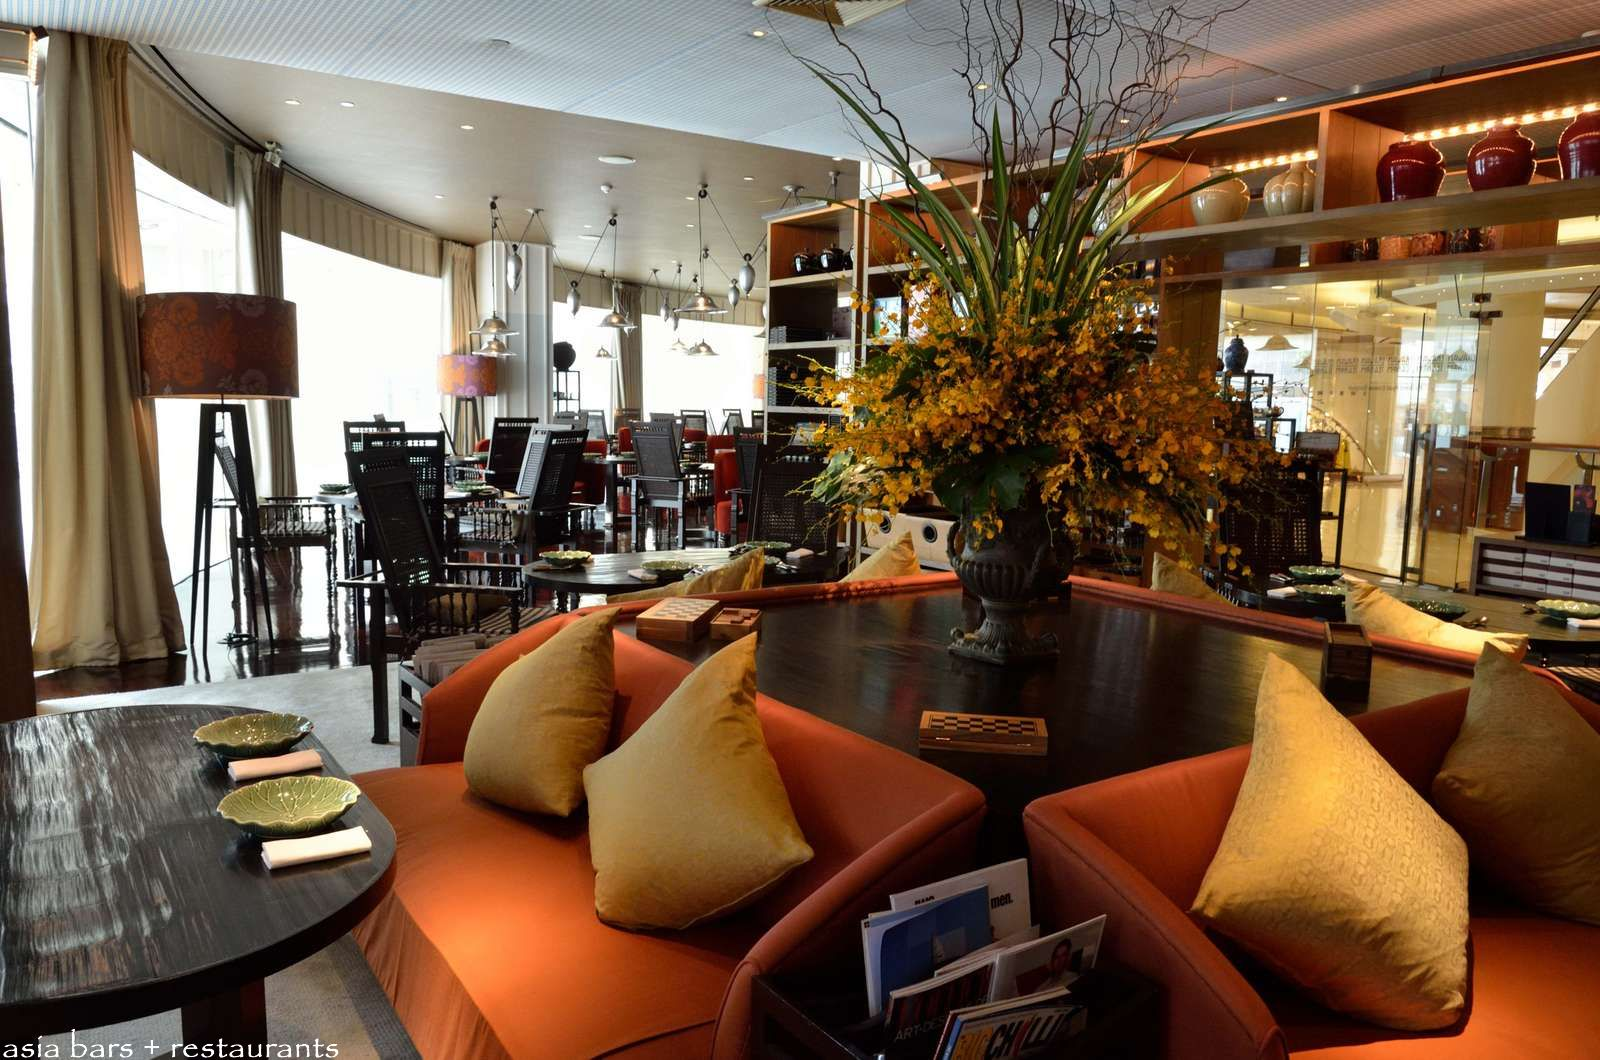 Erawan Tea Room- authentic Thai cuisine at Grand Hyatt Erawan ... on glass house cafe, muffin house cafe, coffee house cafe,